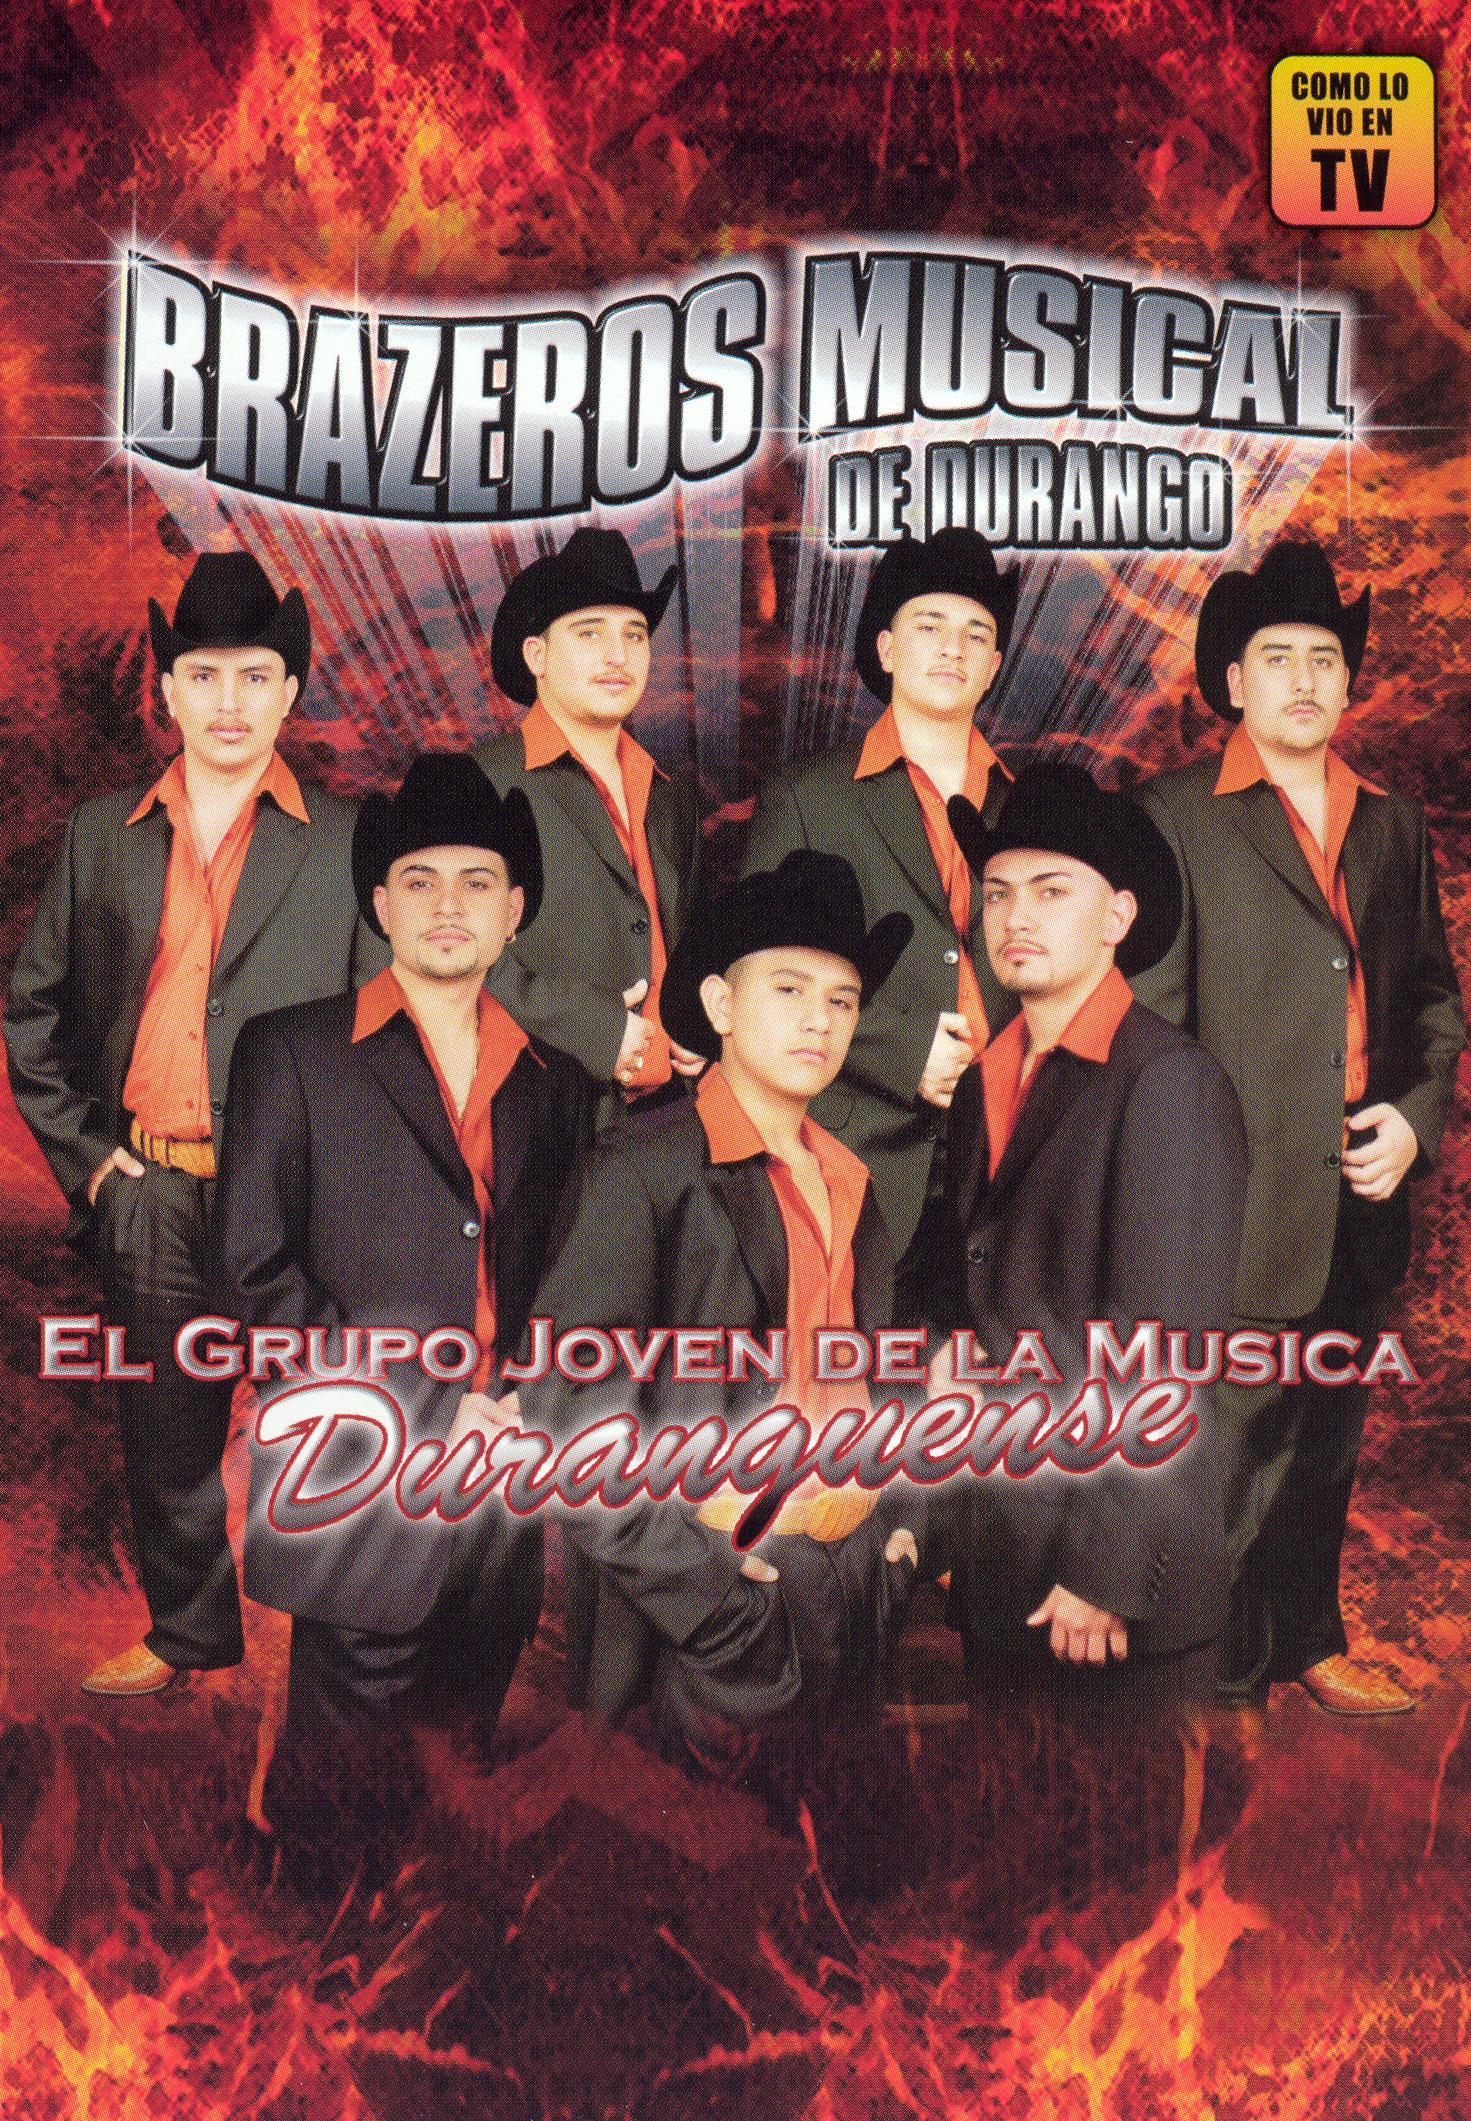 Brazeros Musical: El Grupo Joven... Duranguense